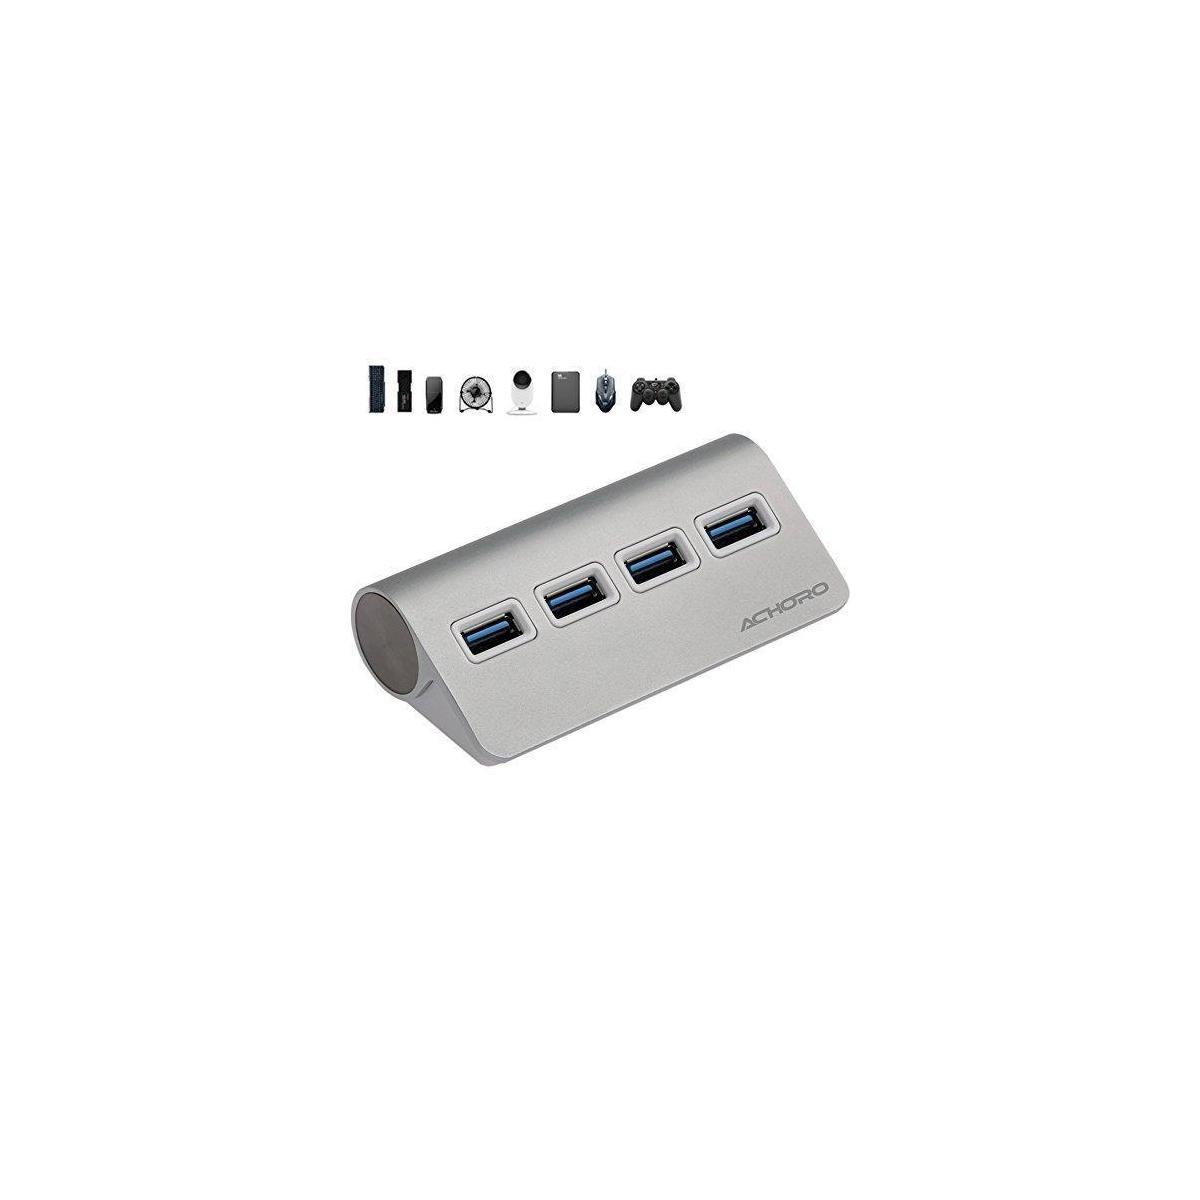 USB Hub 3.0 High Speed Data Transfer - Premium Quality 4 Ports USB HUB Adapter - Compatible with MacBook, Windows, iMac, USB Flash Drive, Hard Drive, PC, and More